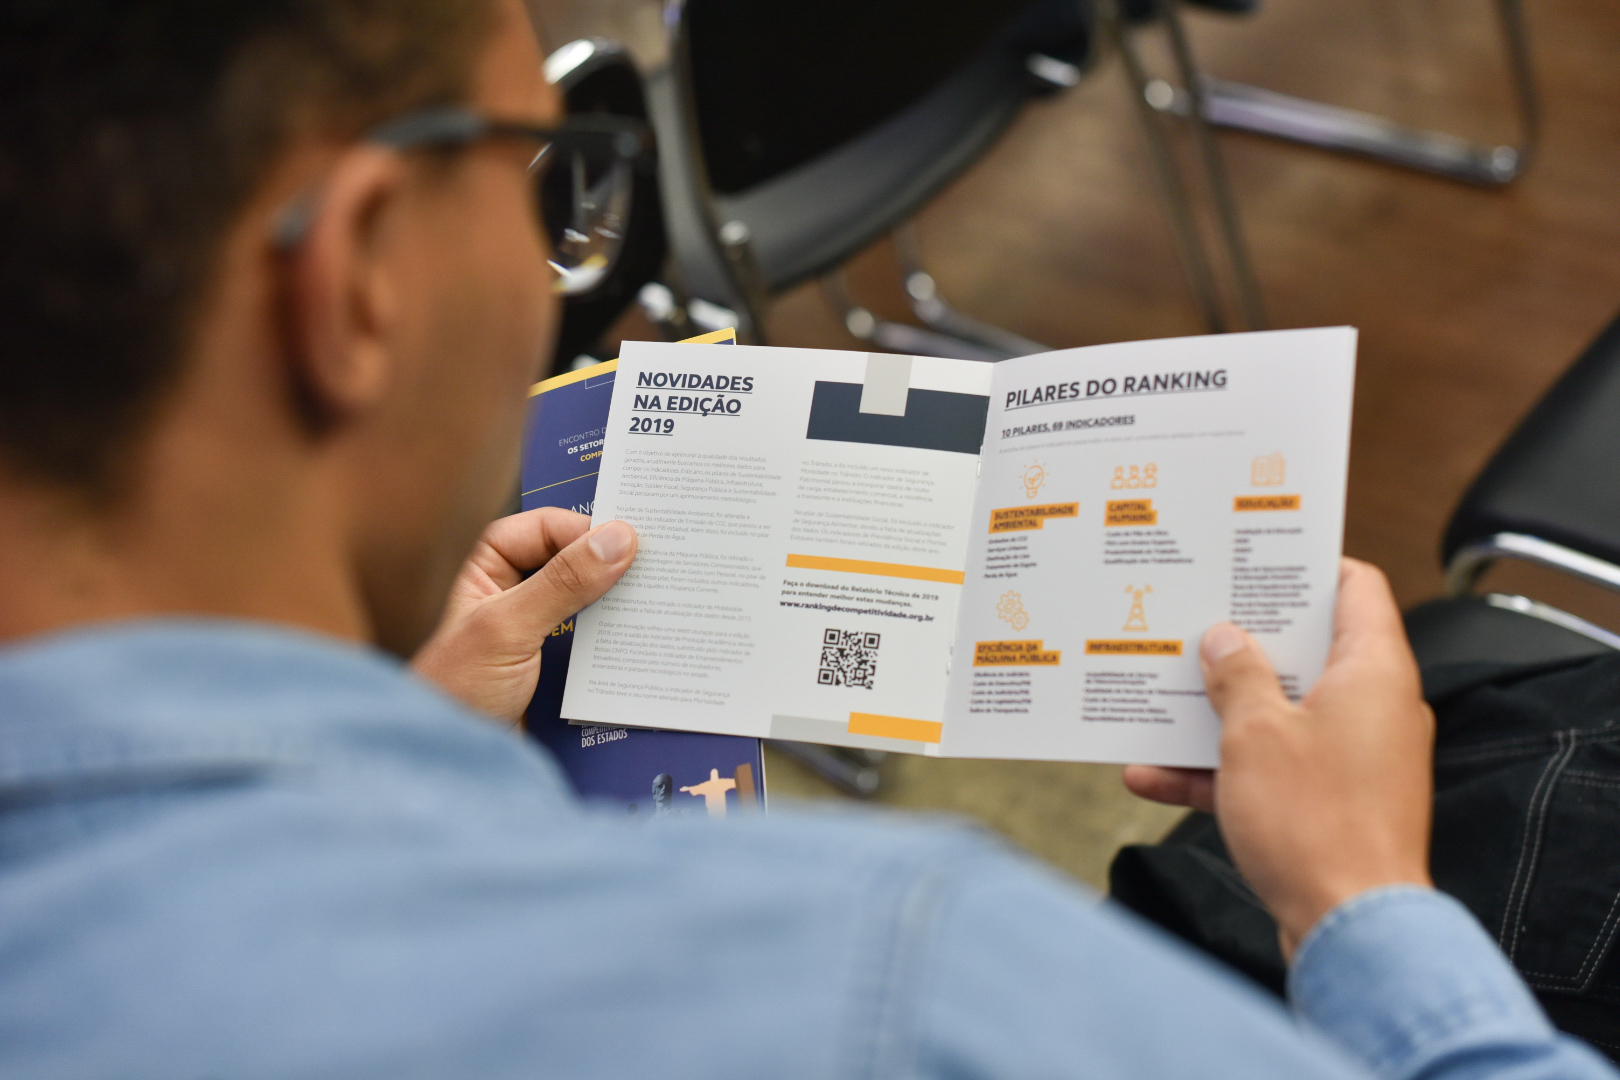 Problemas complexos: newsletter debate desafios dos estados e competitividade no Brasil